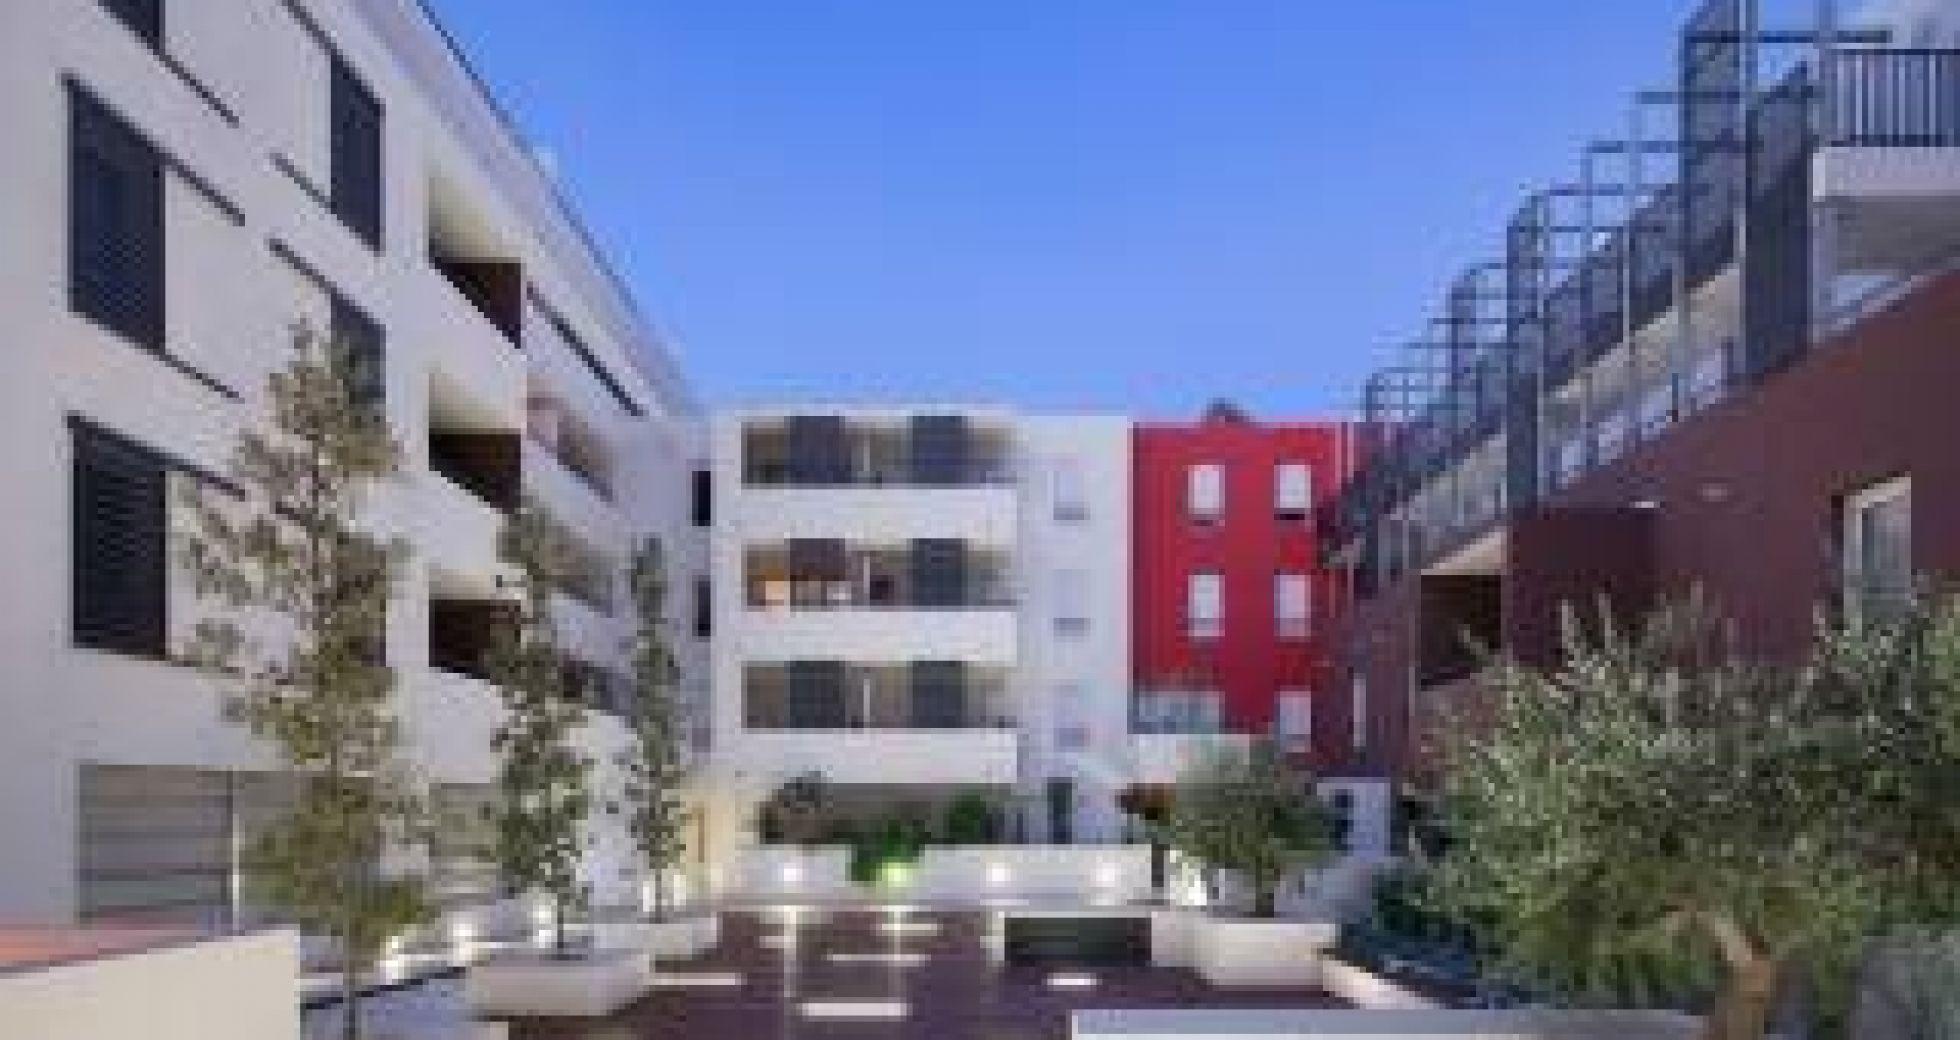 Programme immobilier Montpellier : trouver des candidats